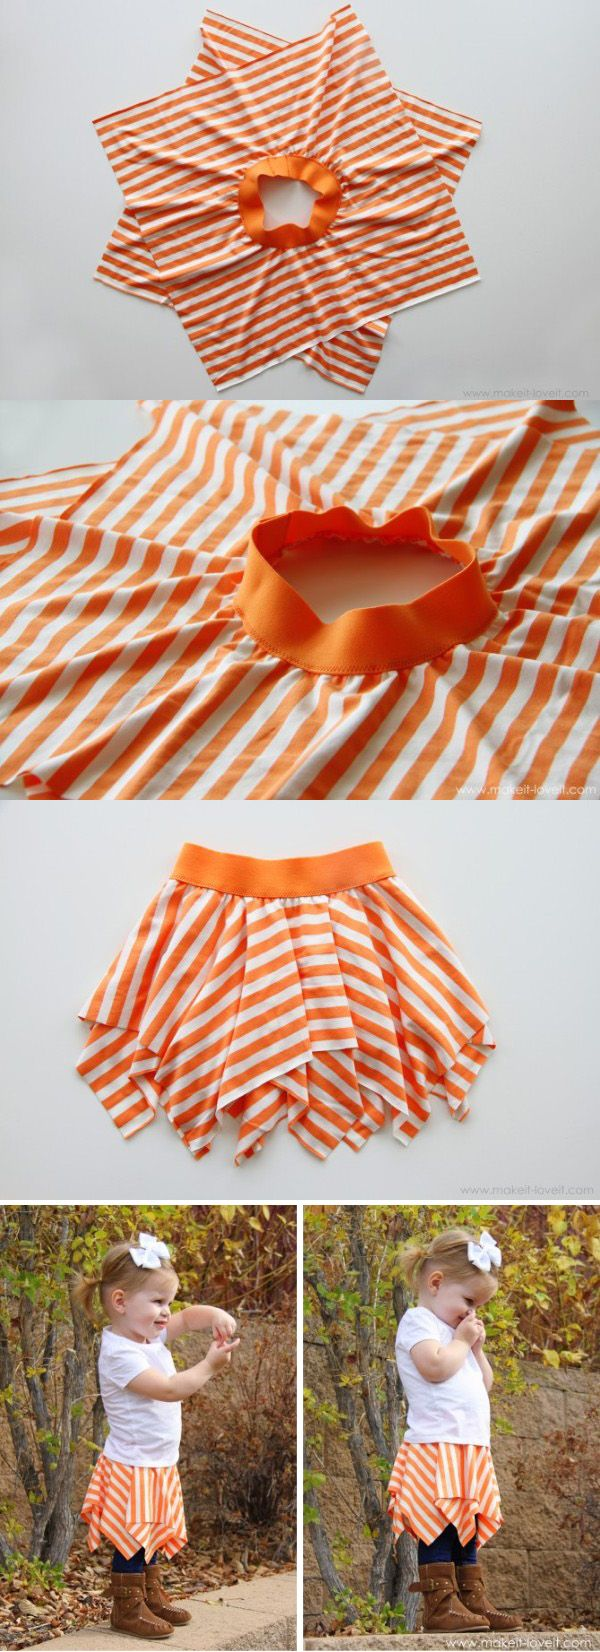 DIY Square Circle Skirt fashion diy diy ideas diy crafts do it yourself crafty diy skirt diy fashion diy pictures